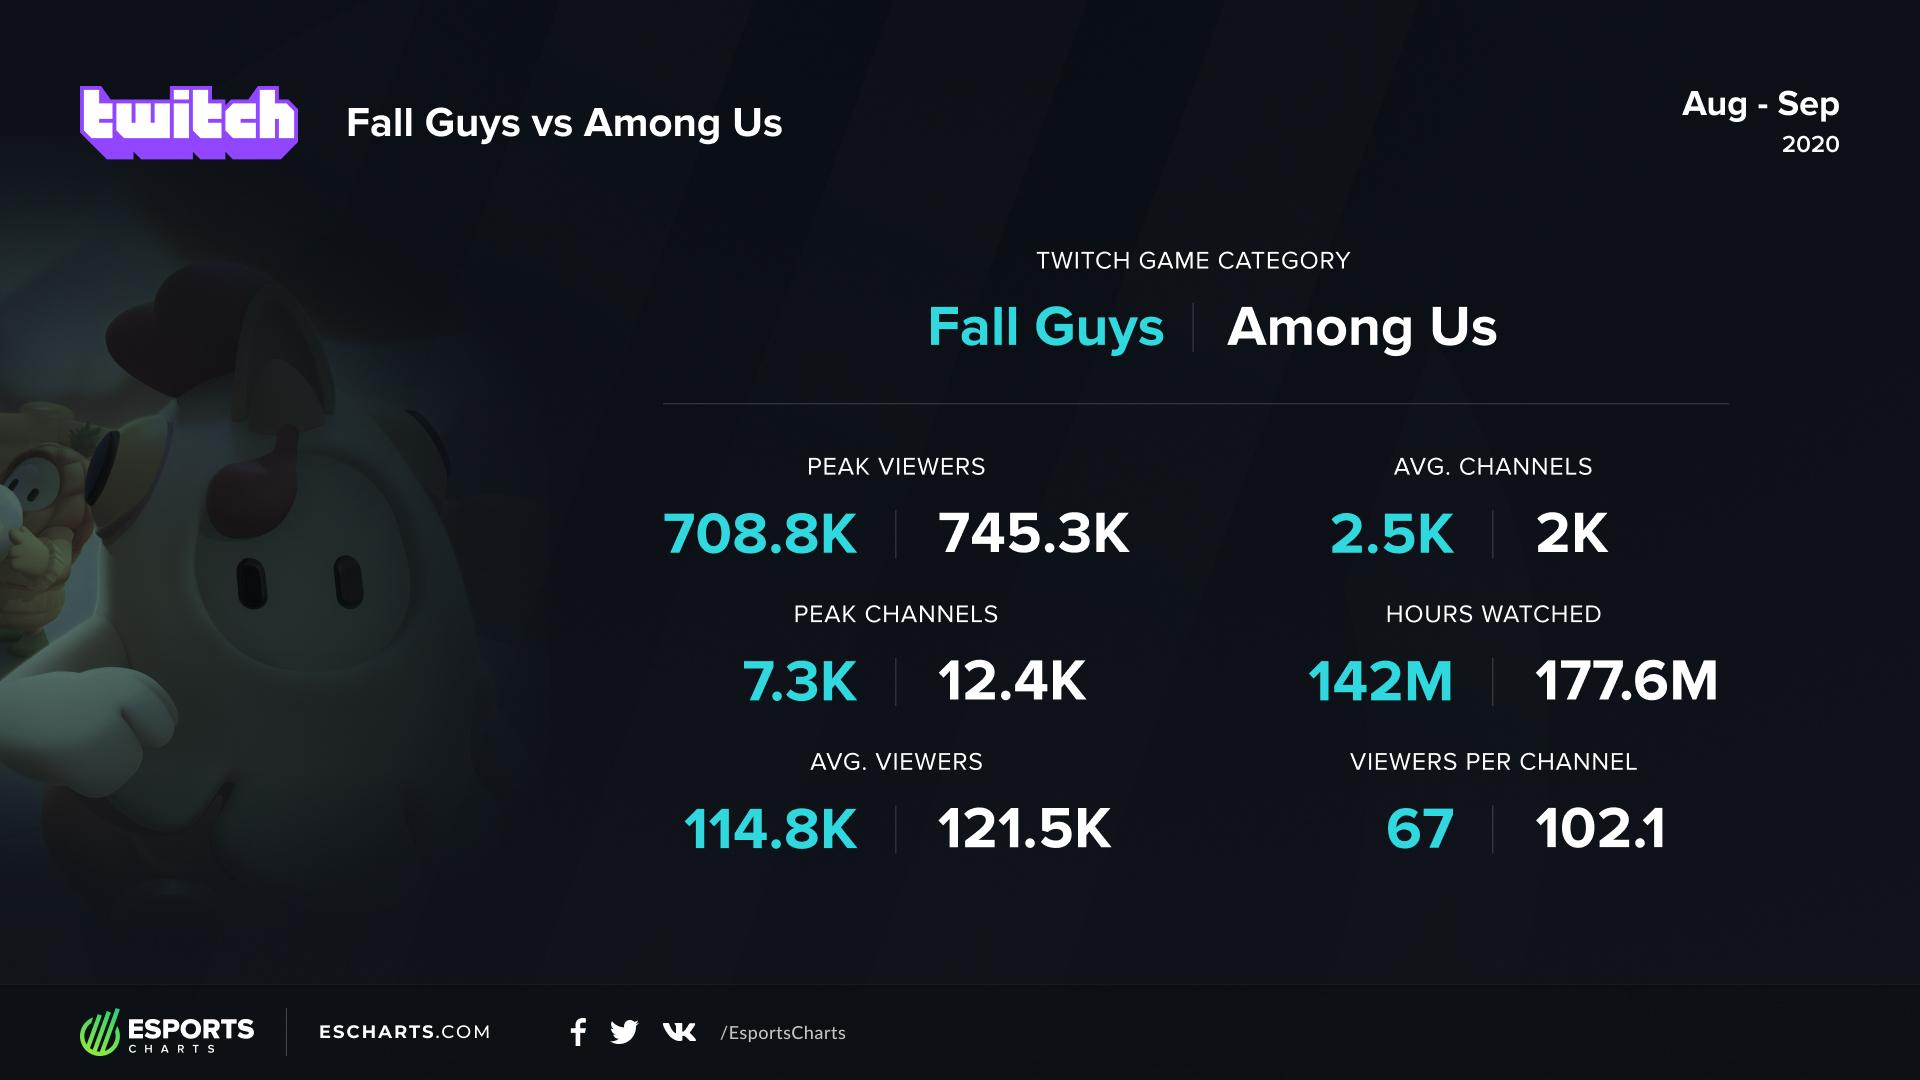 Among Us Vs Fall Guys Viewership Rivalry Esports Charts